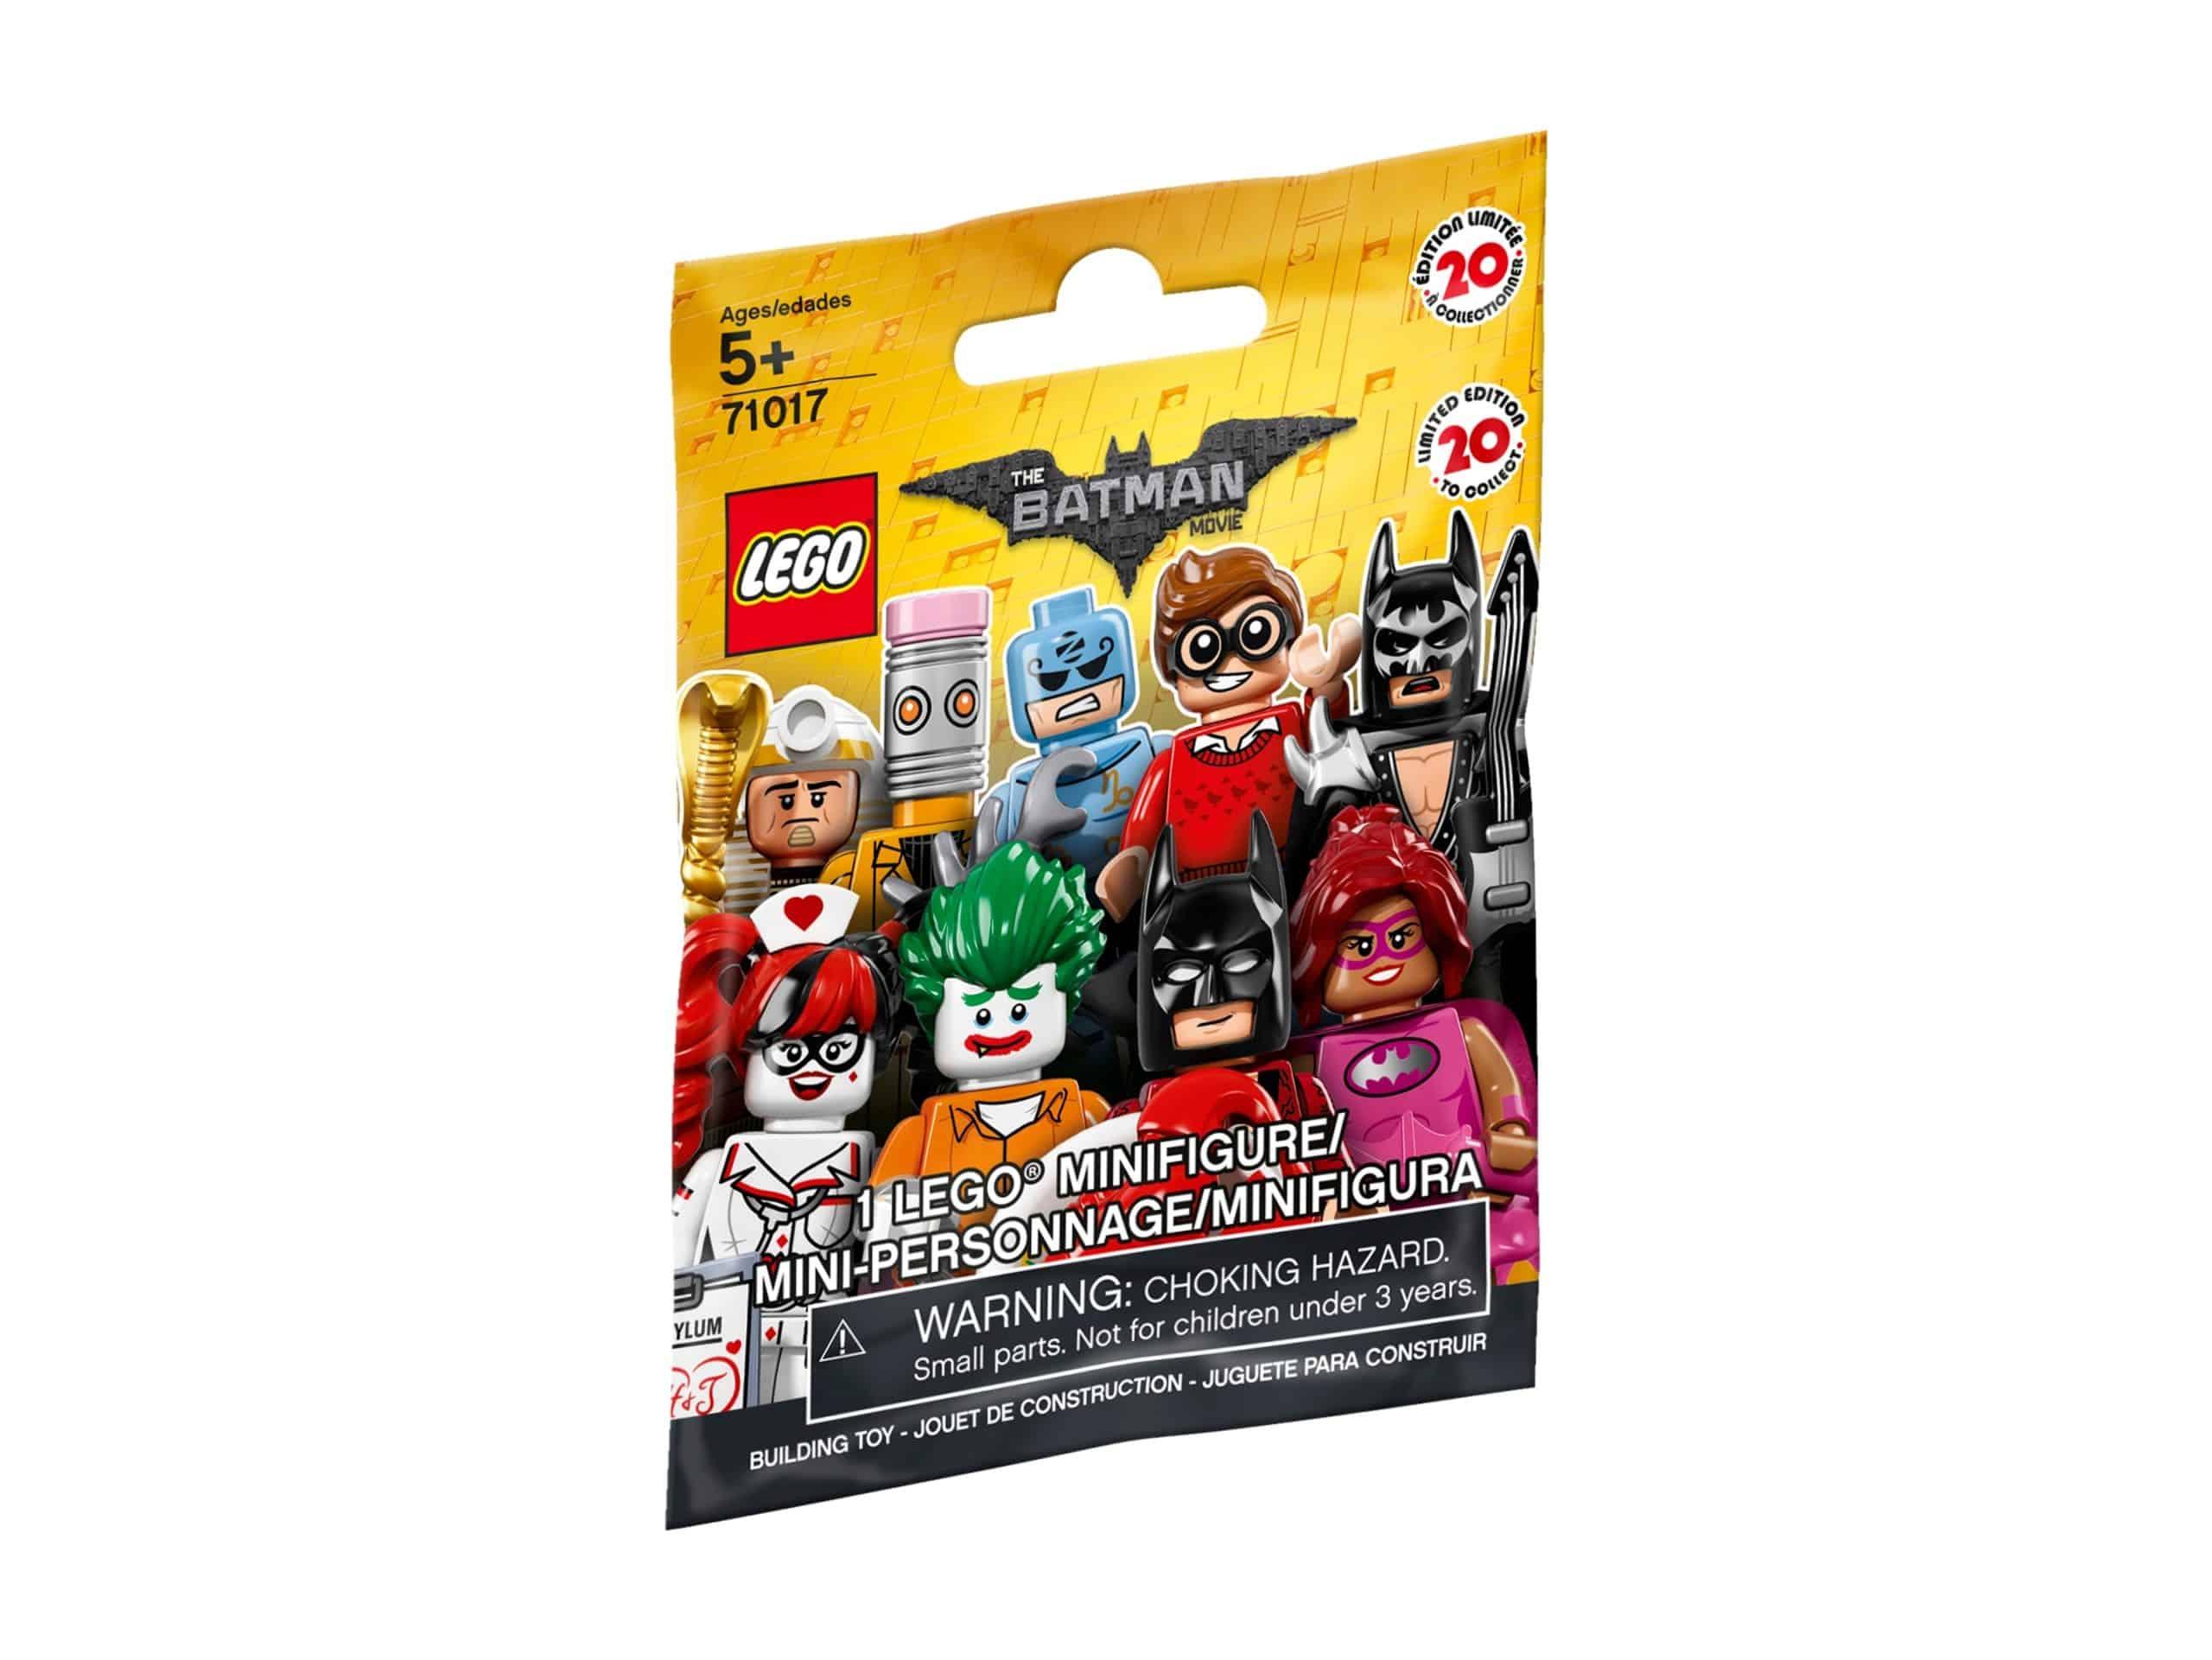 lego 71017 batman movie scaled